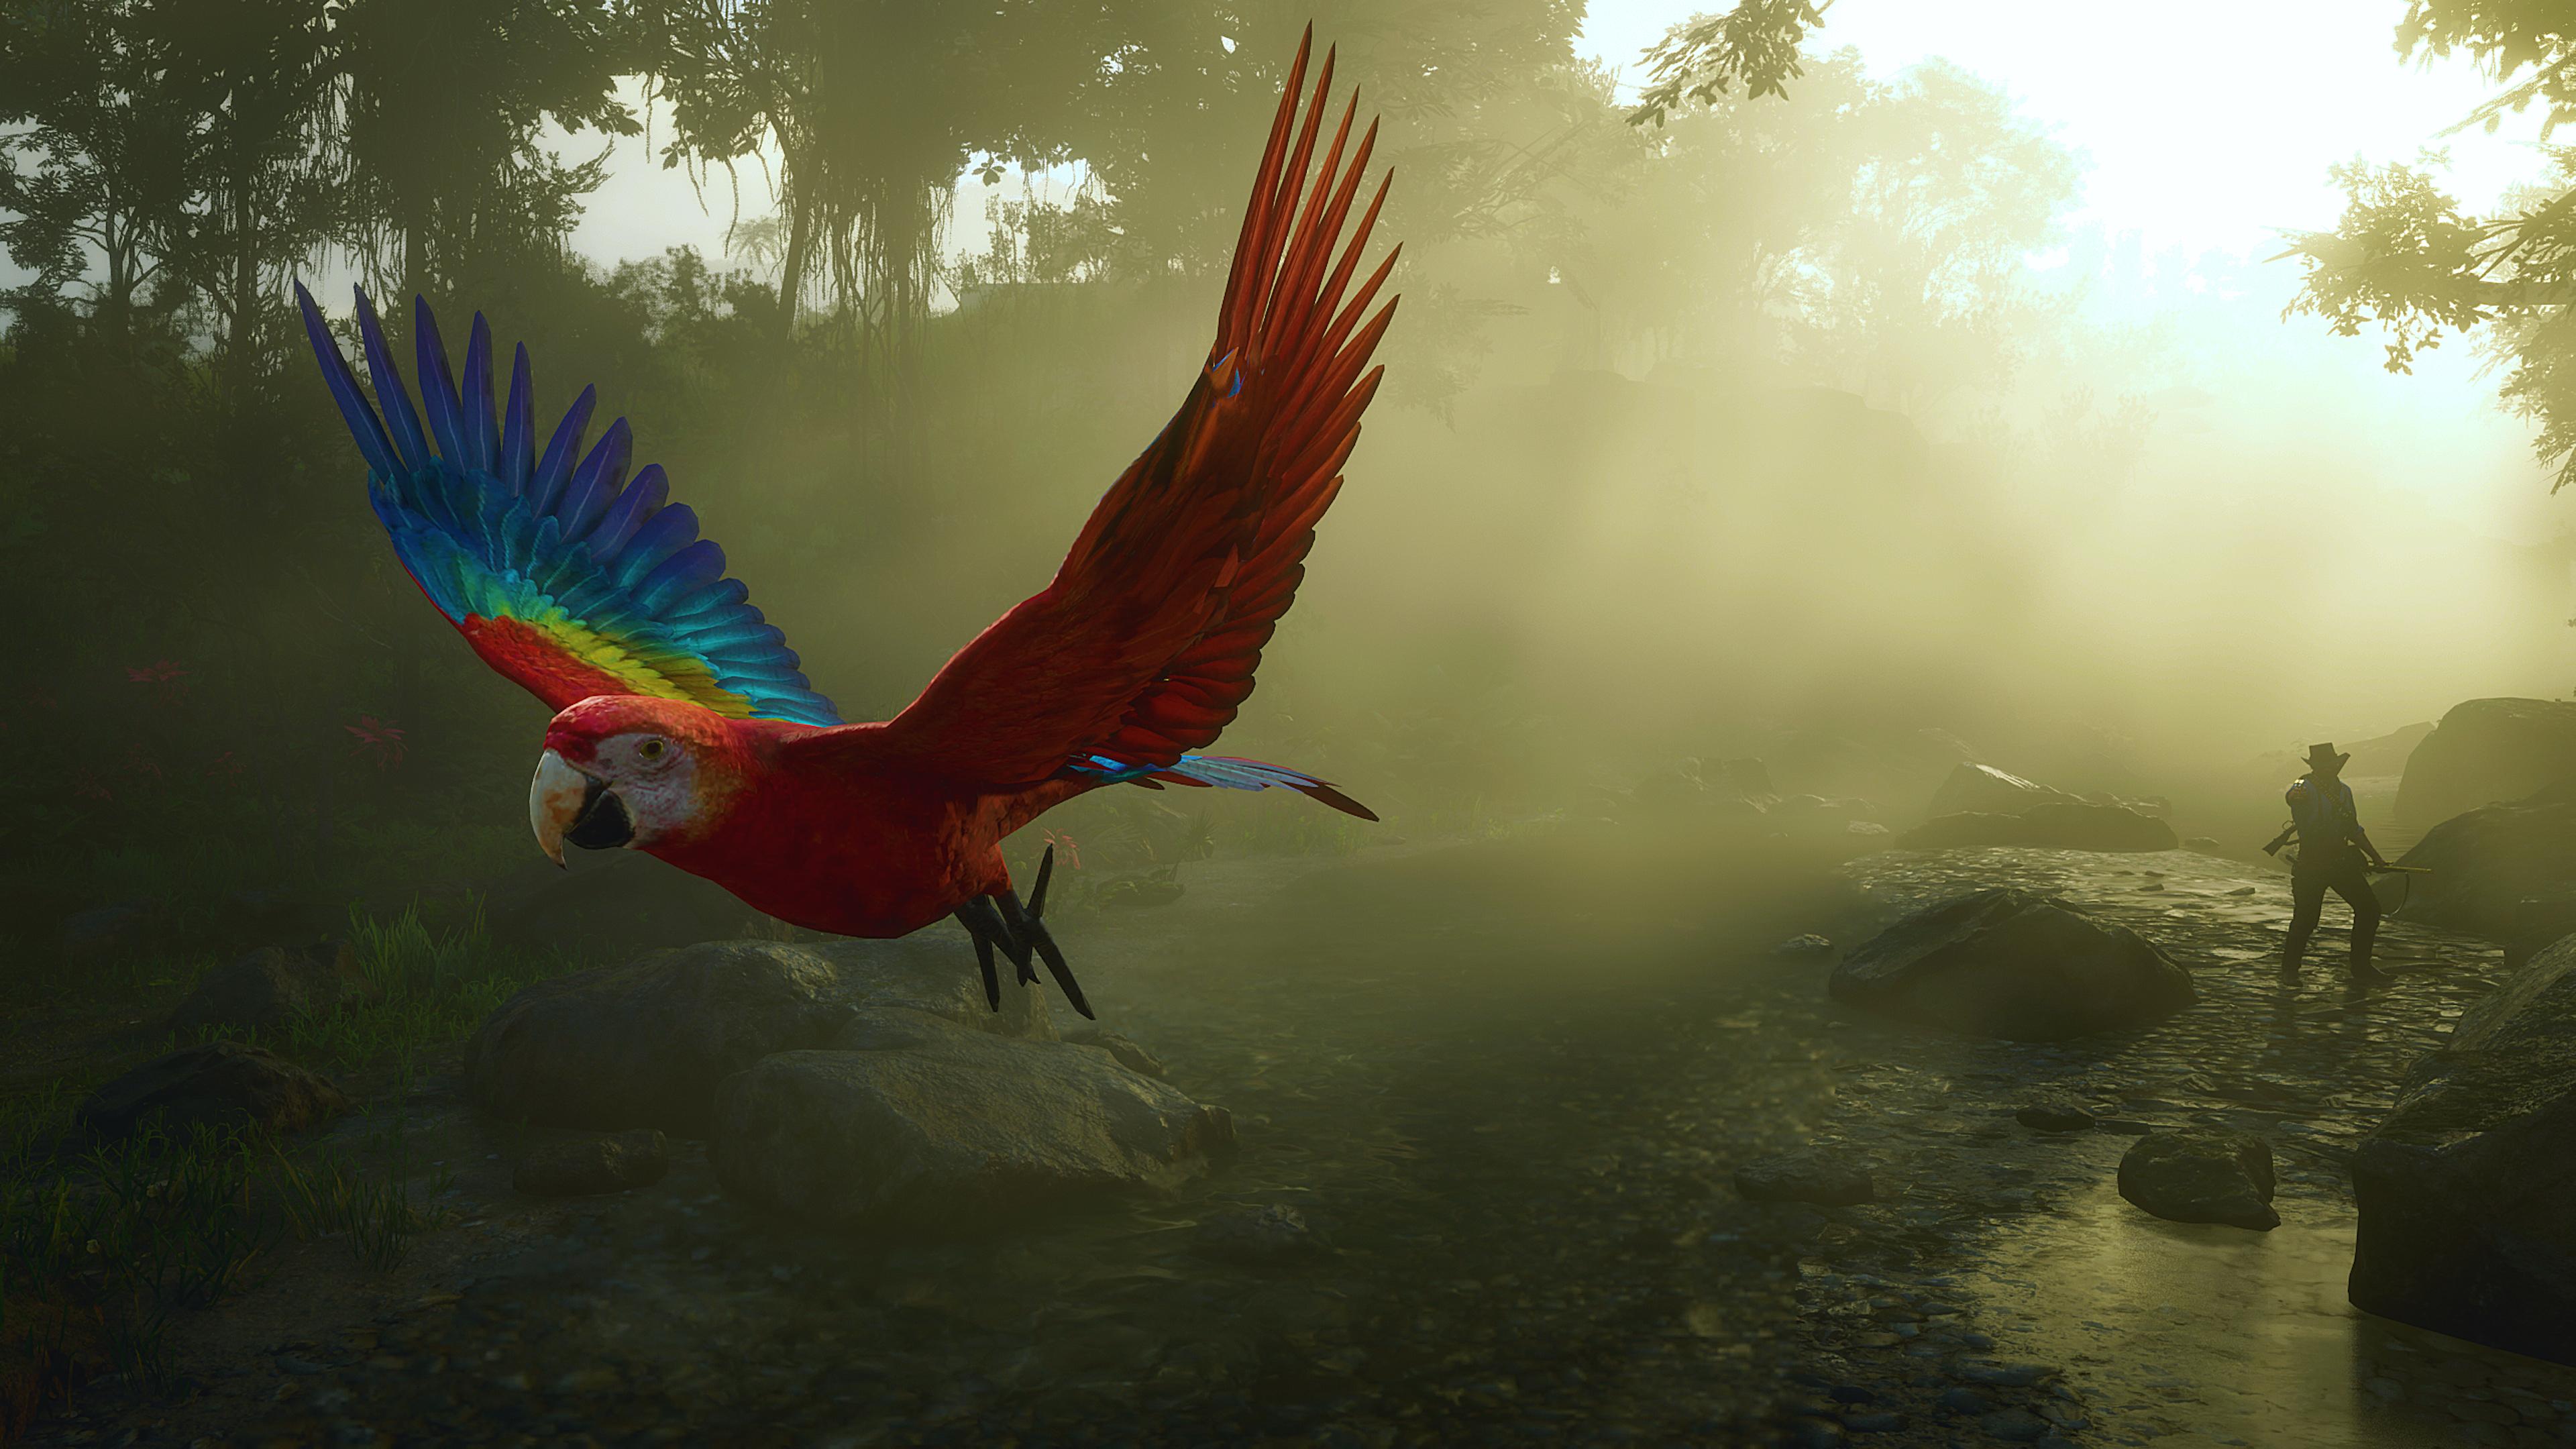 General 3840x2160 Red Dead Redemption Red Dead Redemption 2 landscape parrot animals birds western video games PC gaming